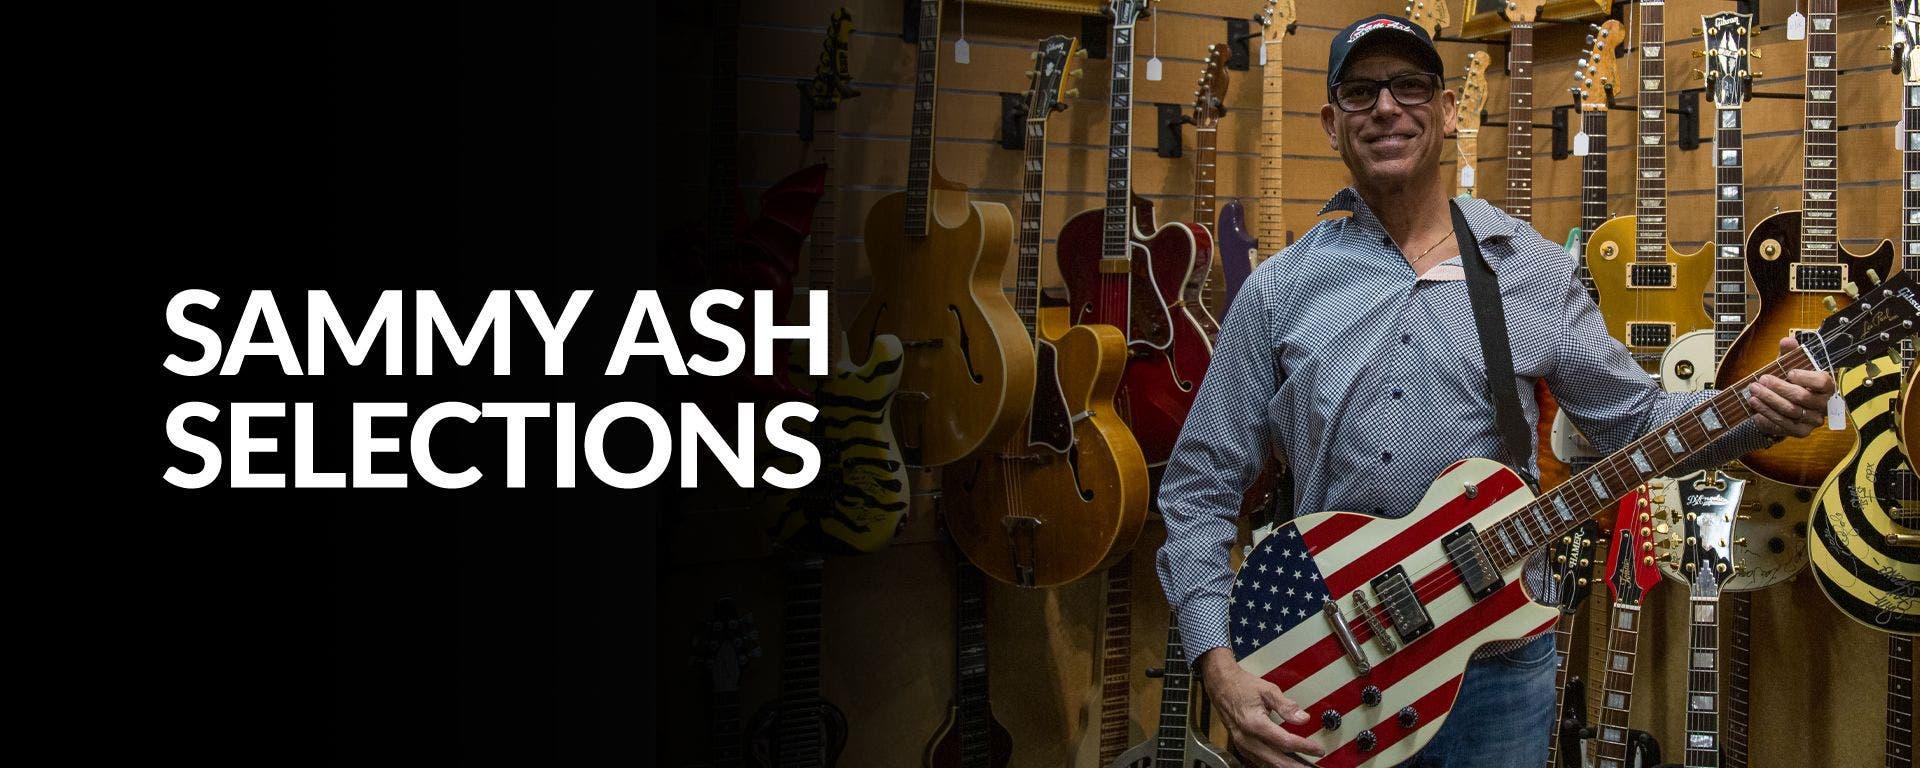 Sammy Ash Selected Used Guitars at Sam Ash